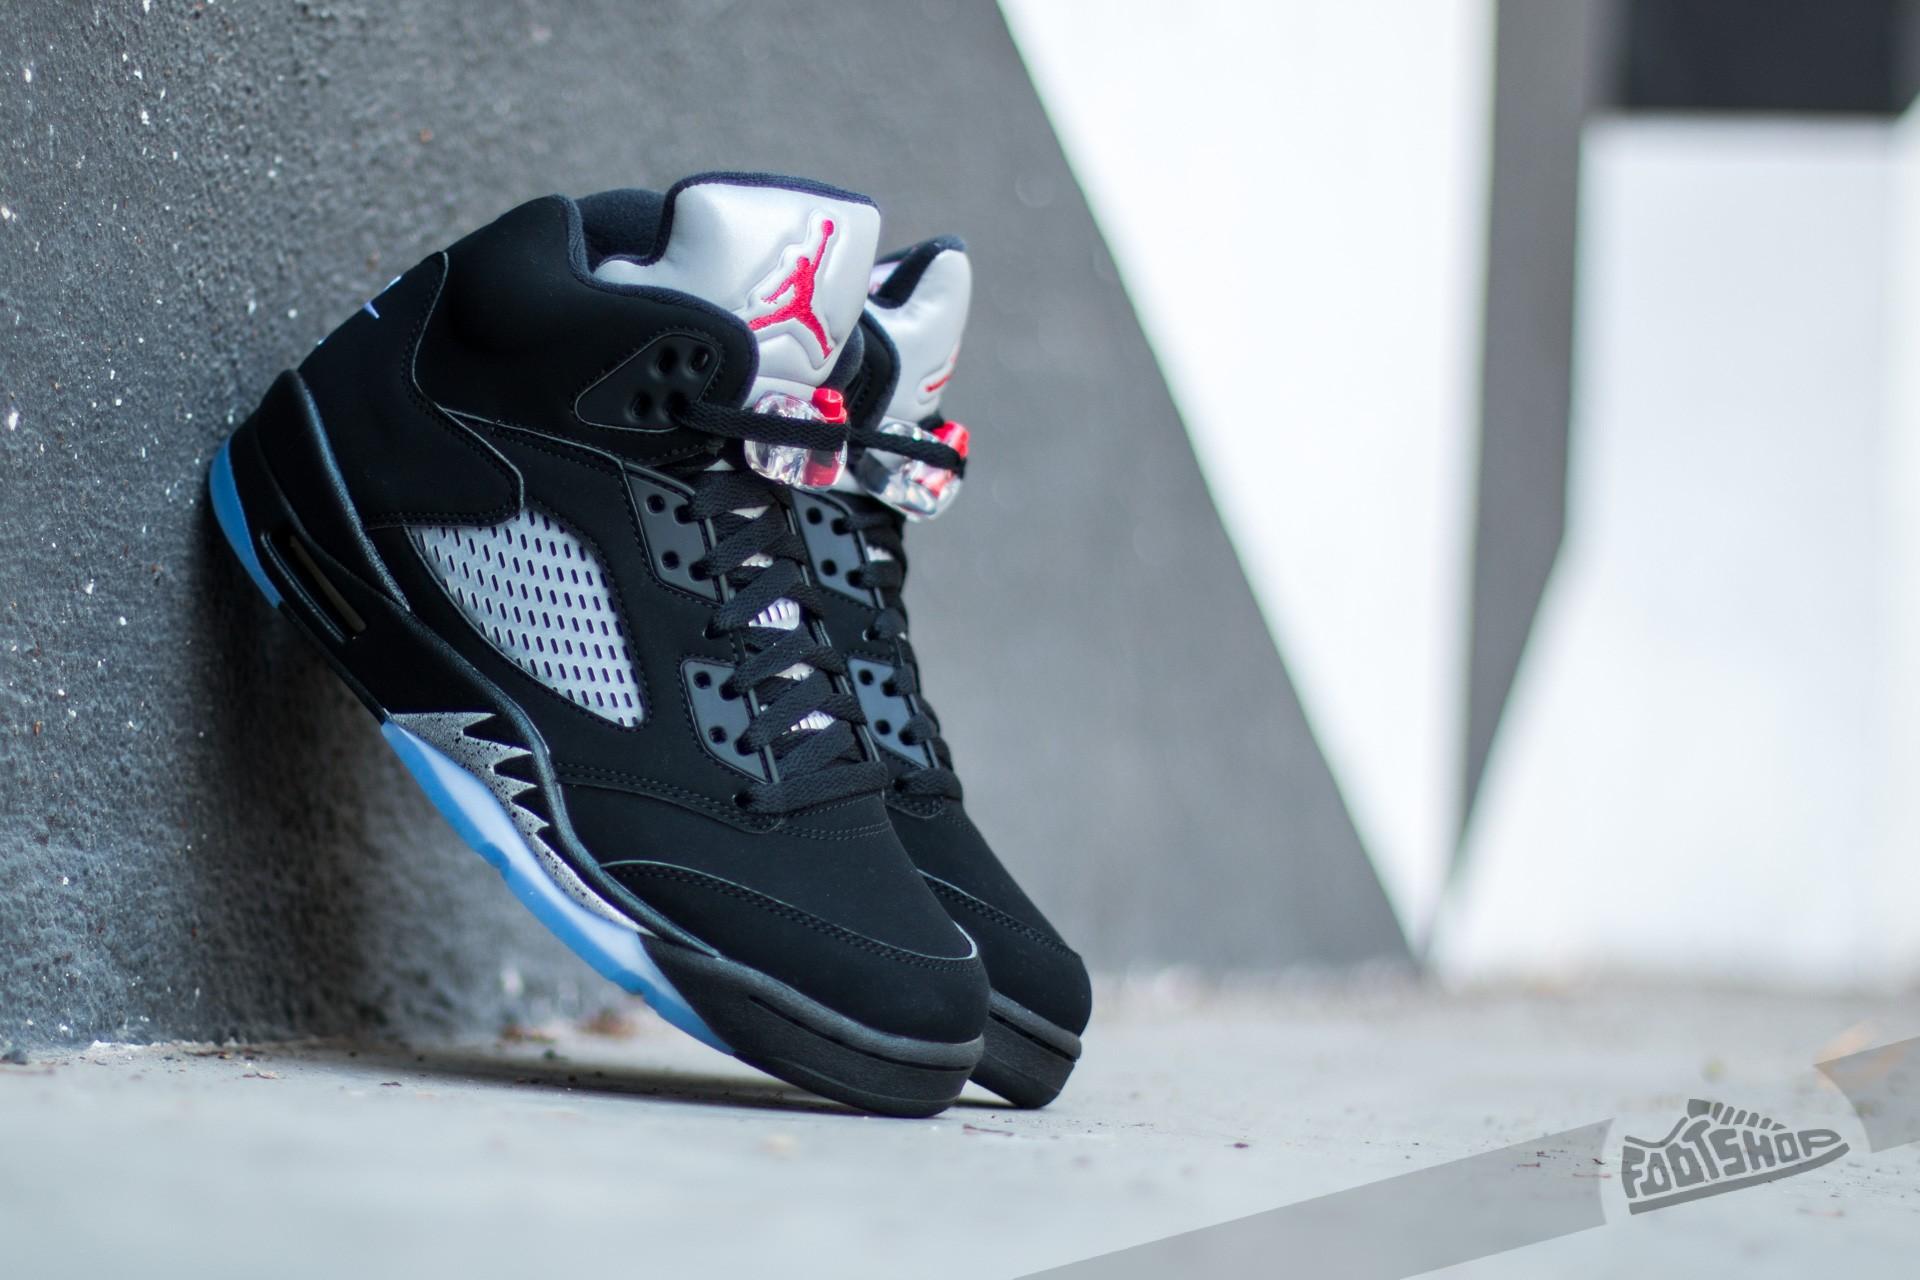 sports shoes e5c85 6b46d Air Jordan 5 Retro OG Black/ Fire Red-Metallic-Silver-White ...